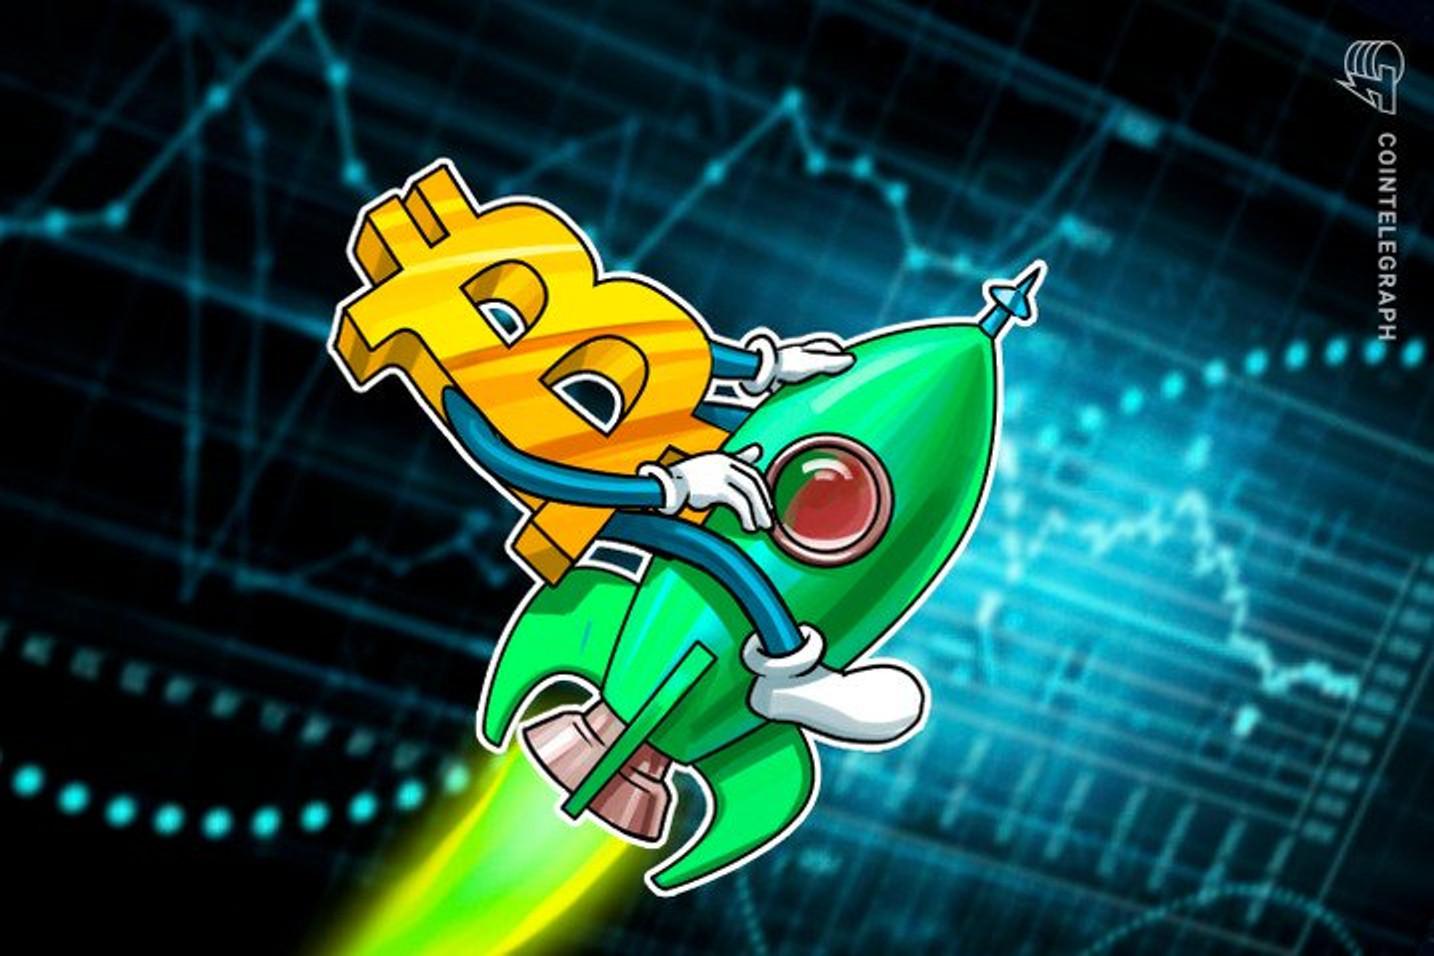 QR Capital cita Stock-to-Flow para dizer que Bitcoin pode chegar a US$ 55 mil